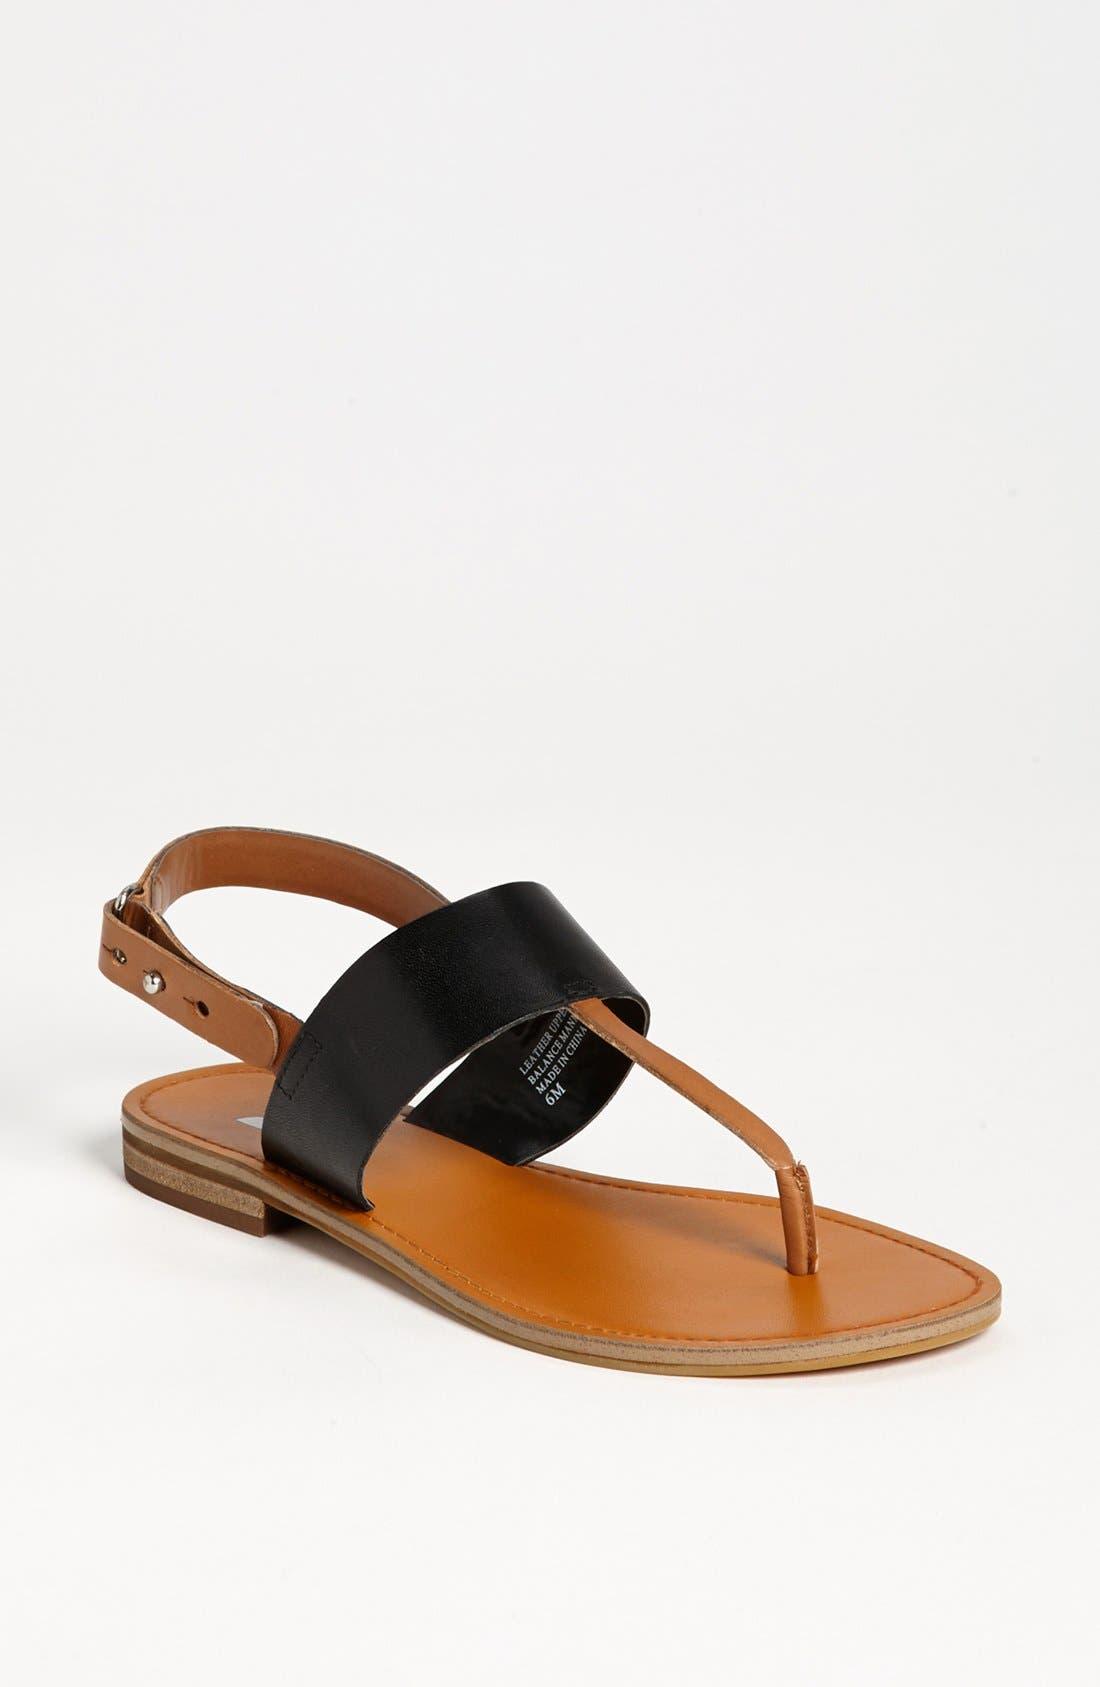 Main Image - BP. 'Barbados' Sandal